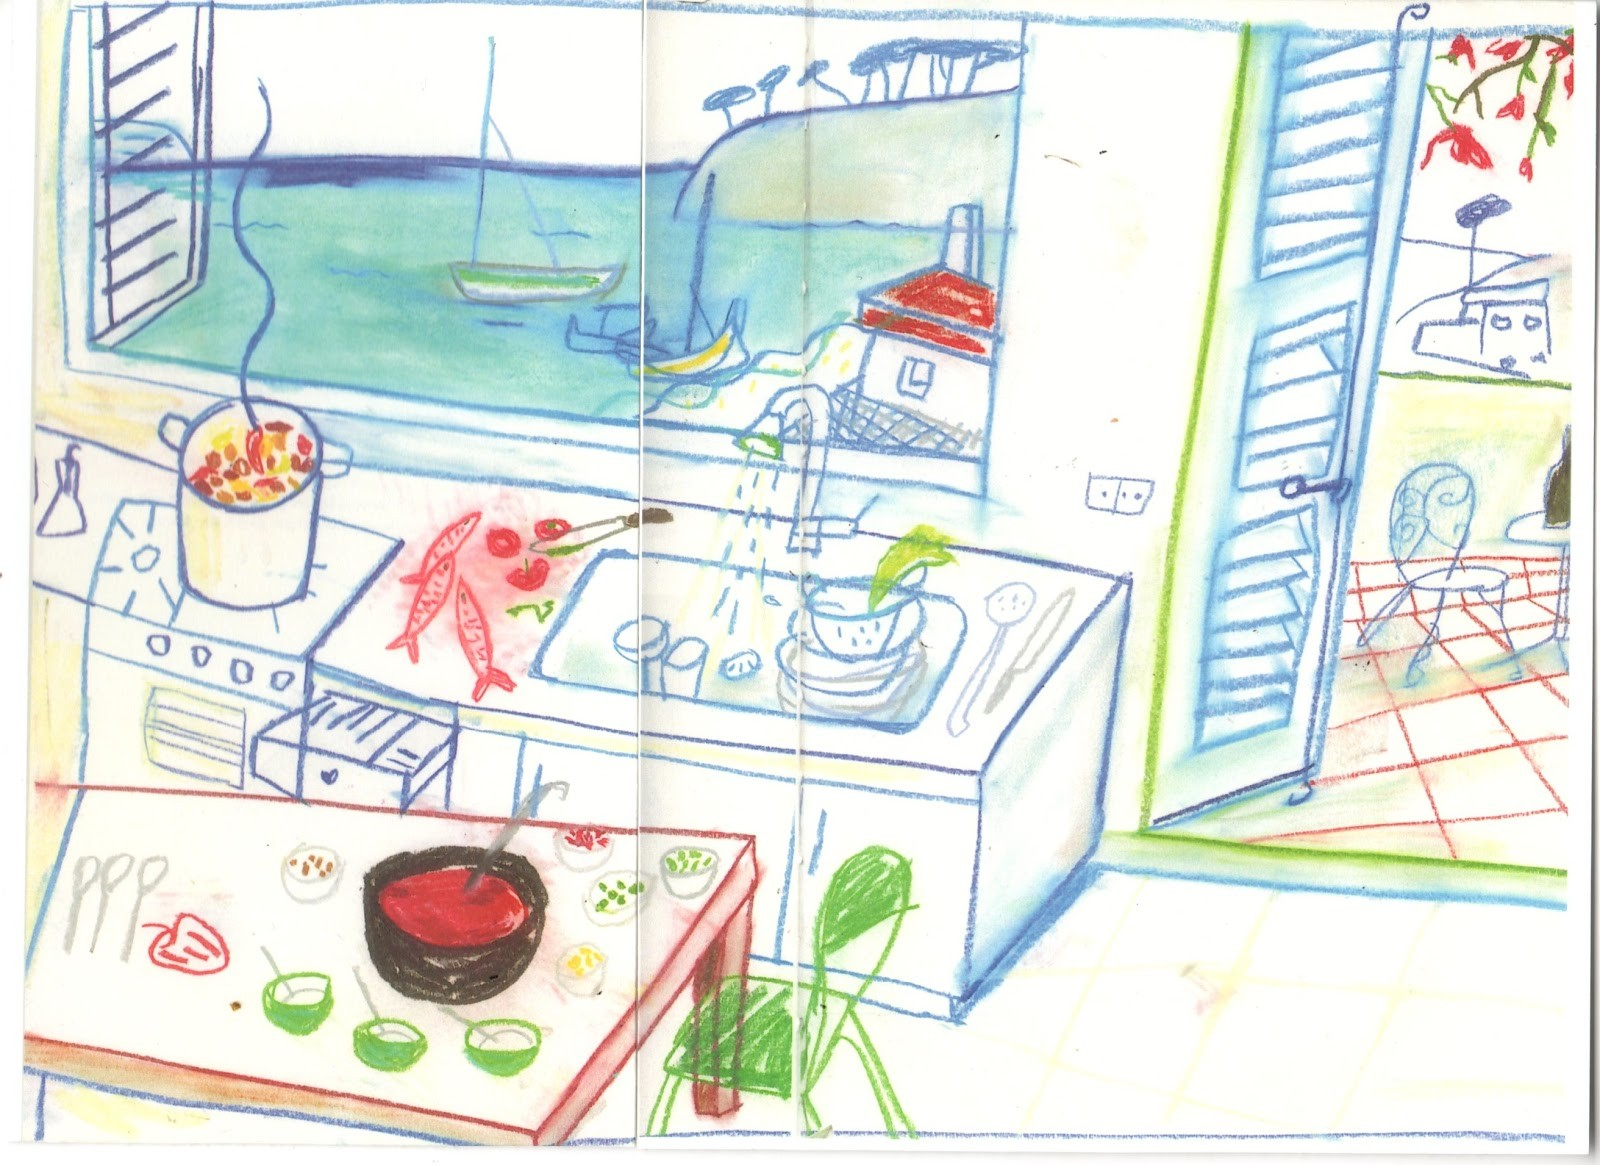 1080 Recipes by Simone and Ines Ortega 2